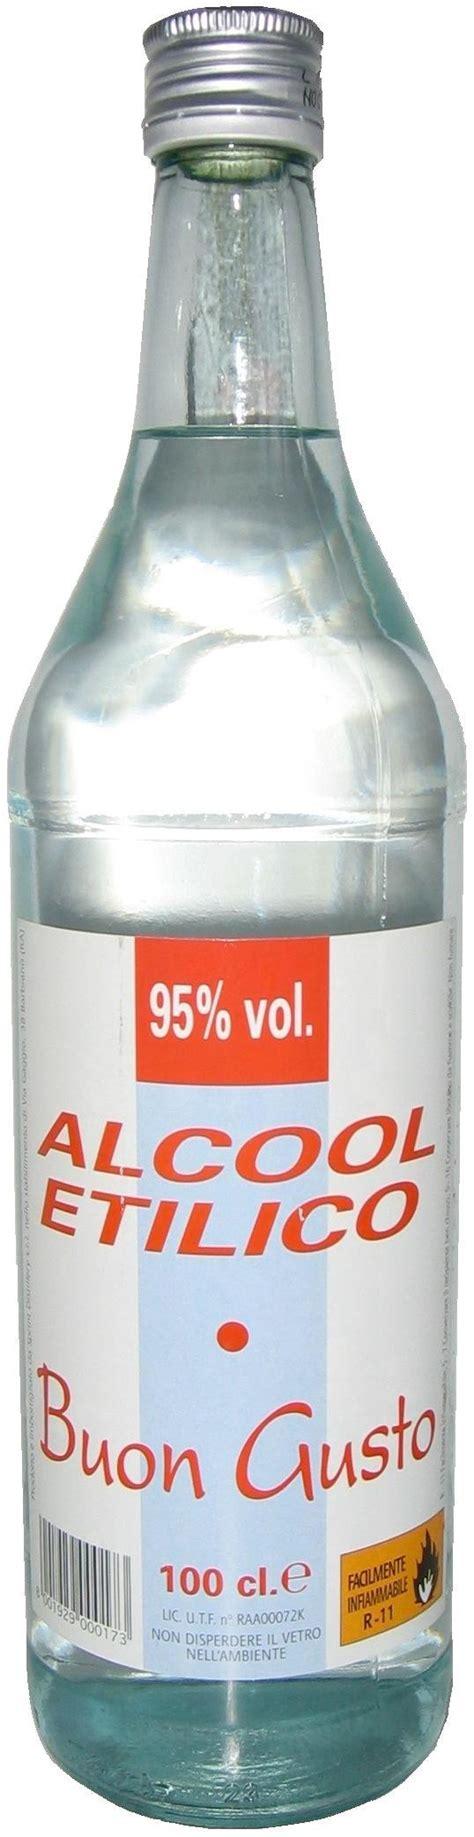 alcool alimentare etanolo alcool etilico